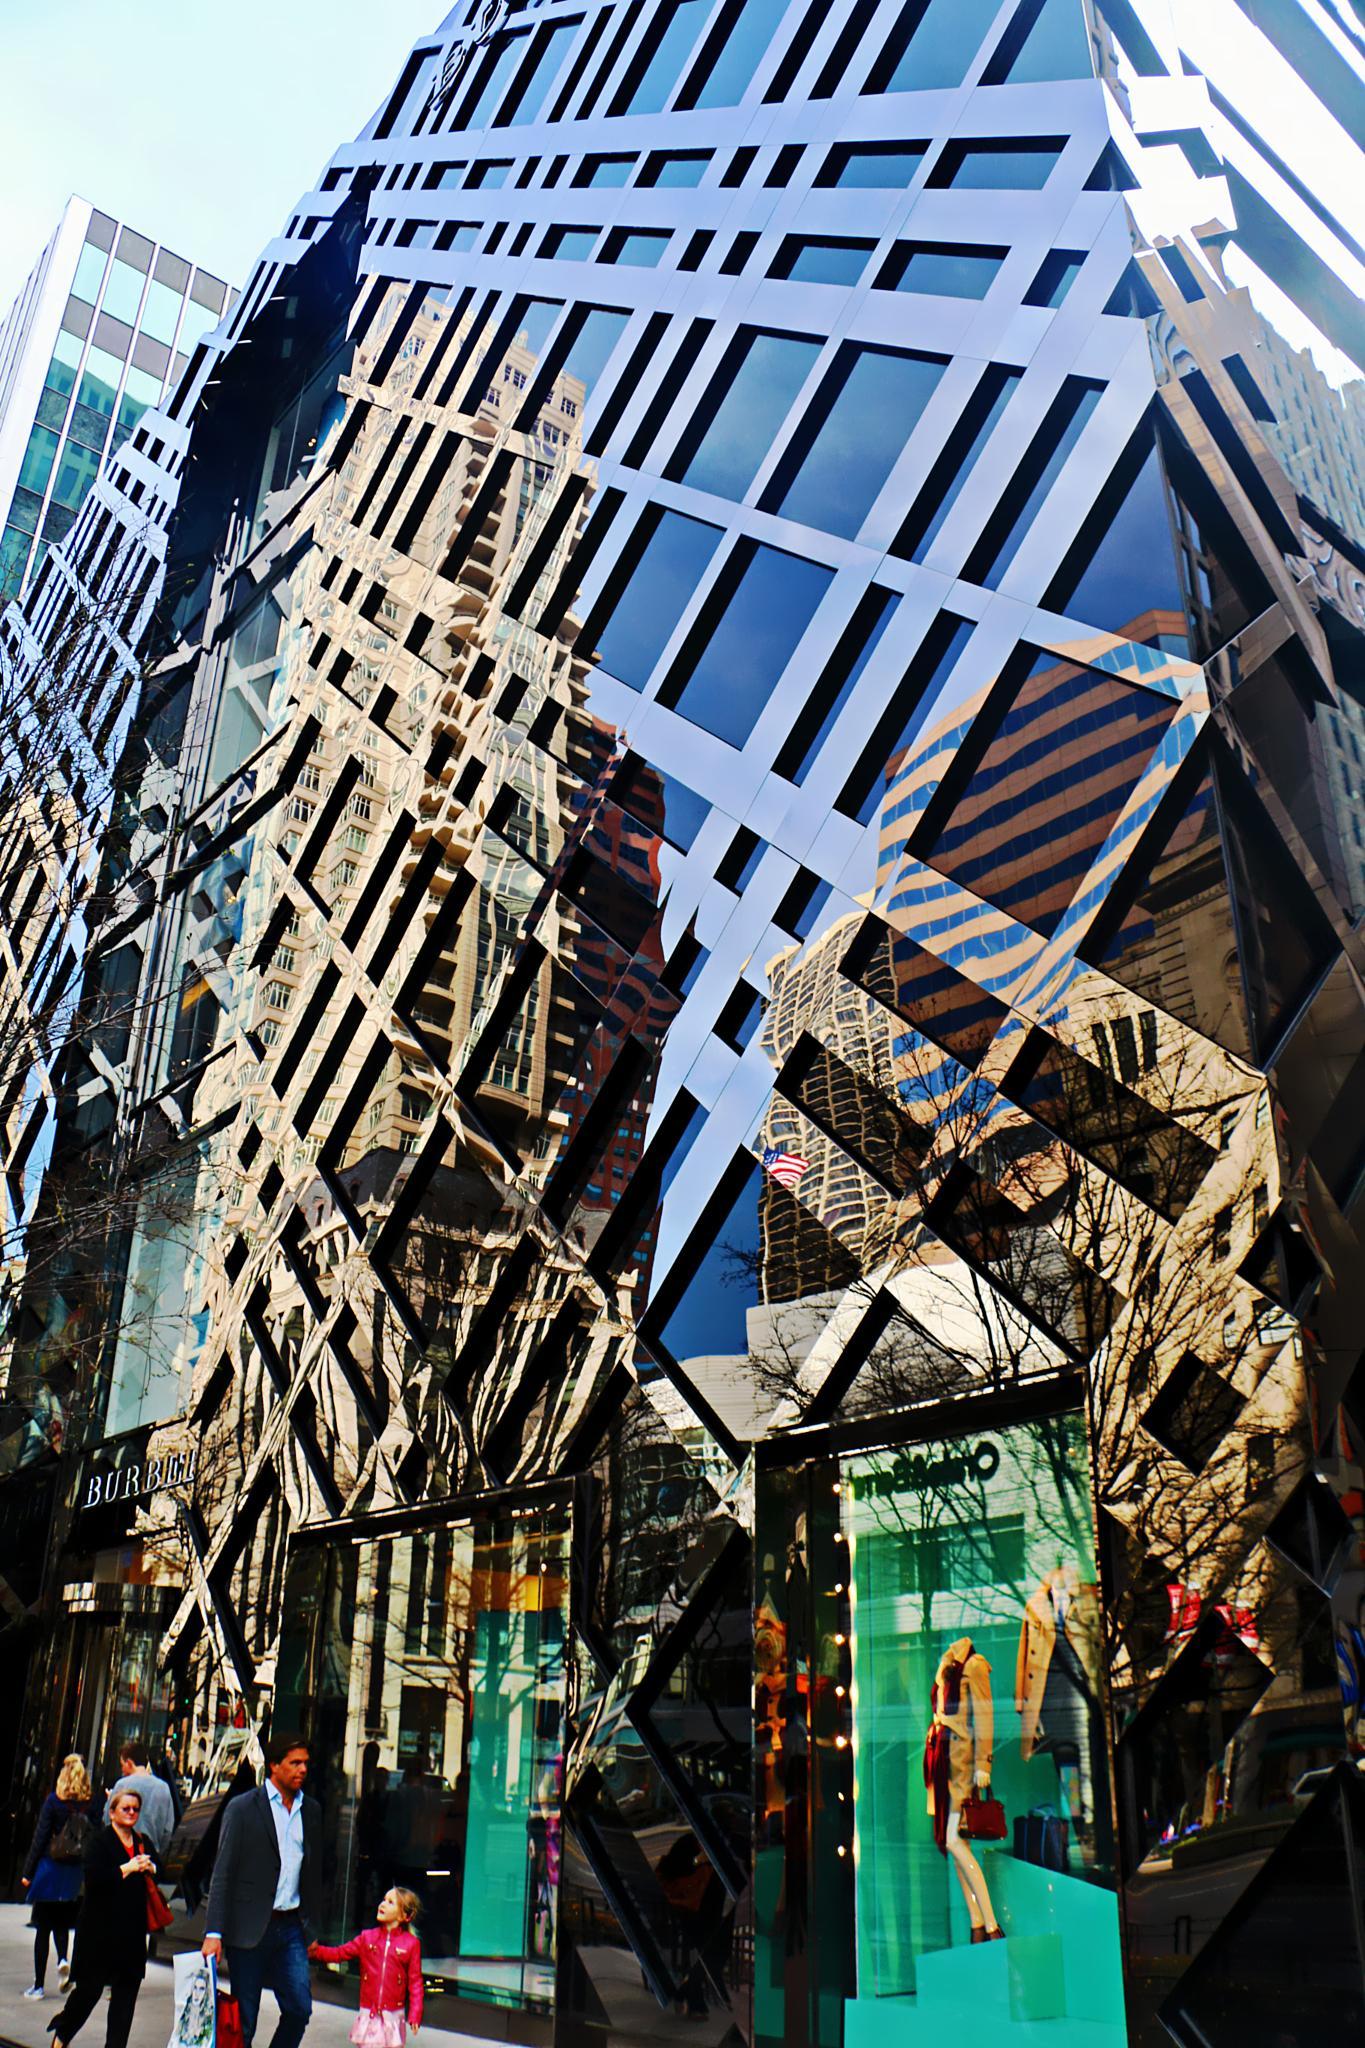 The reflection cross building by Jon Radtke